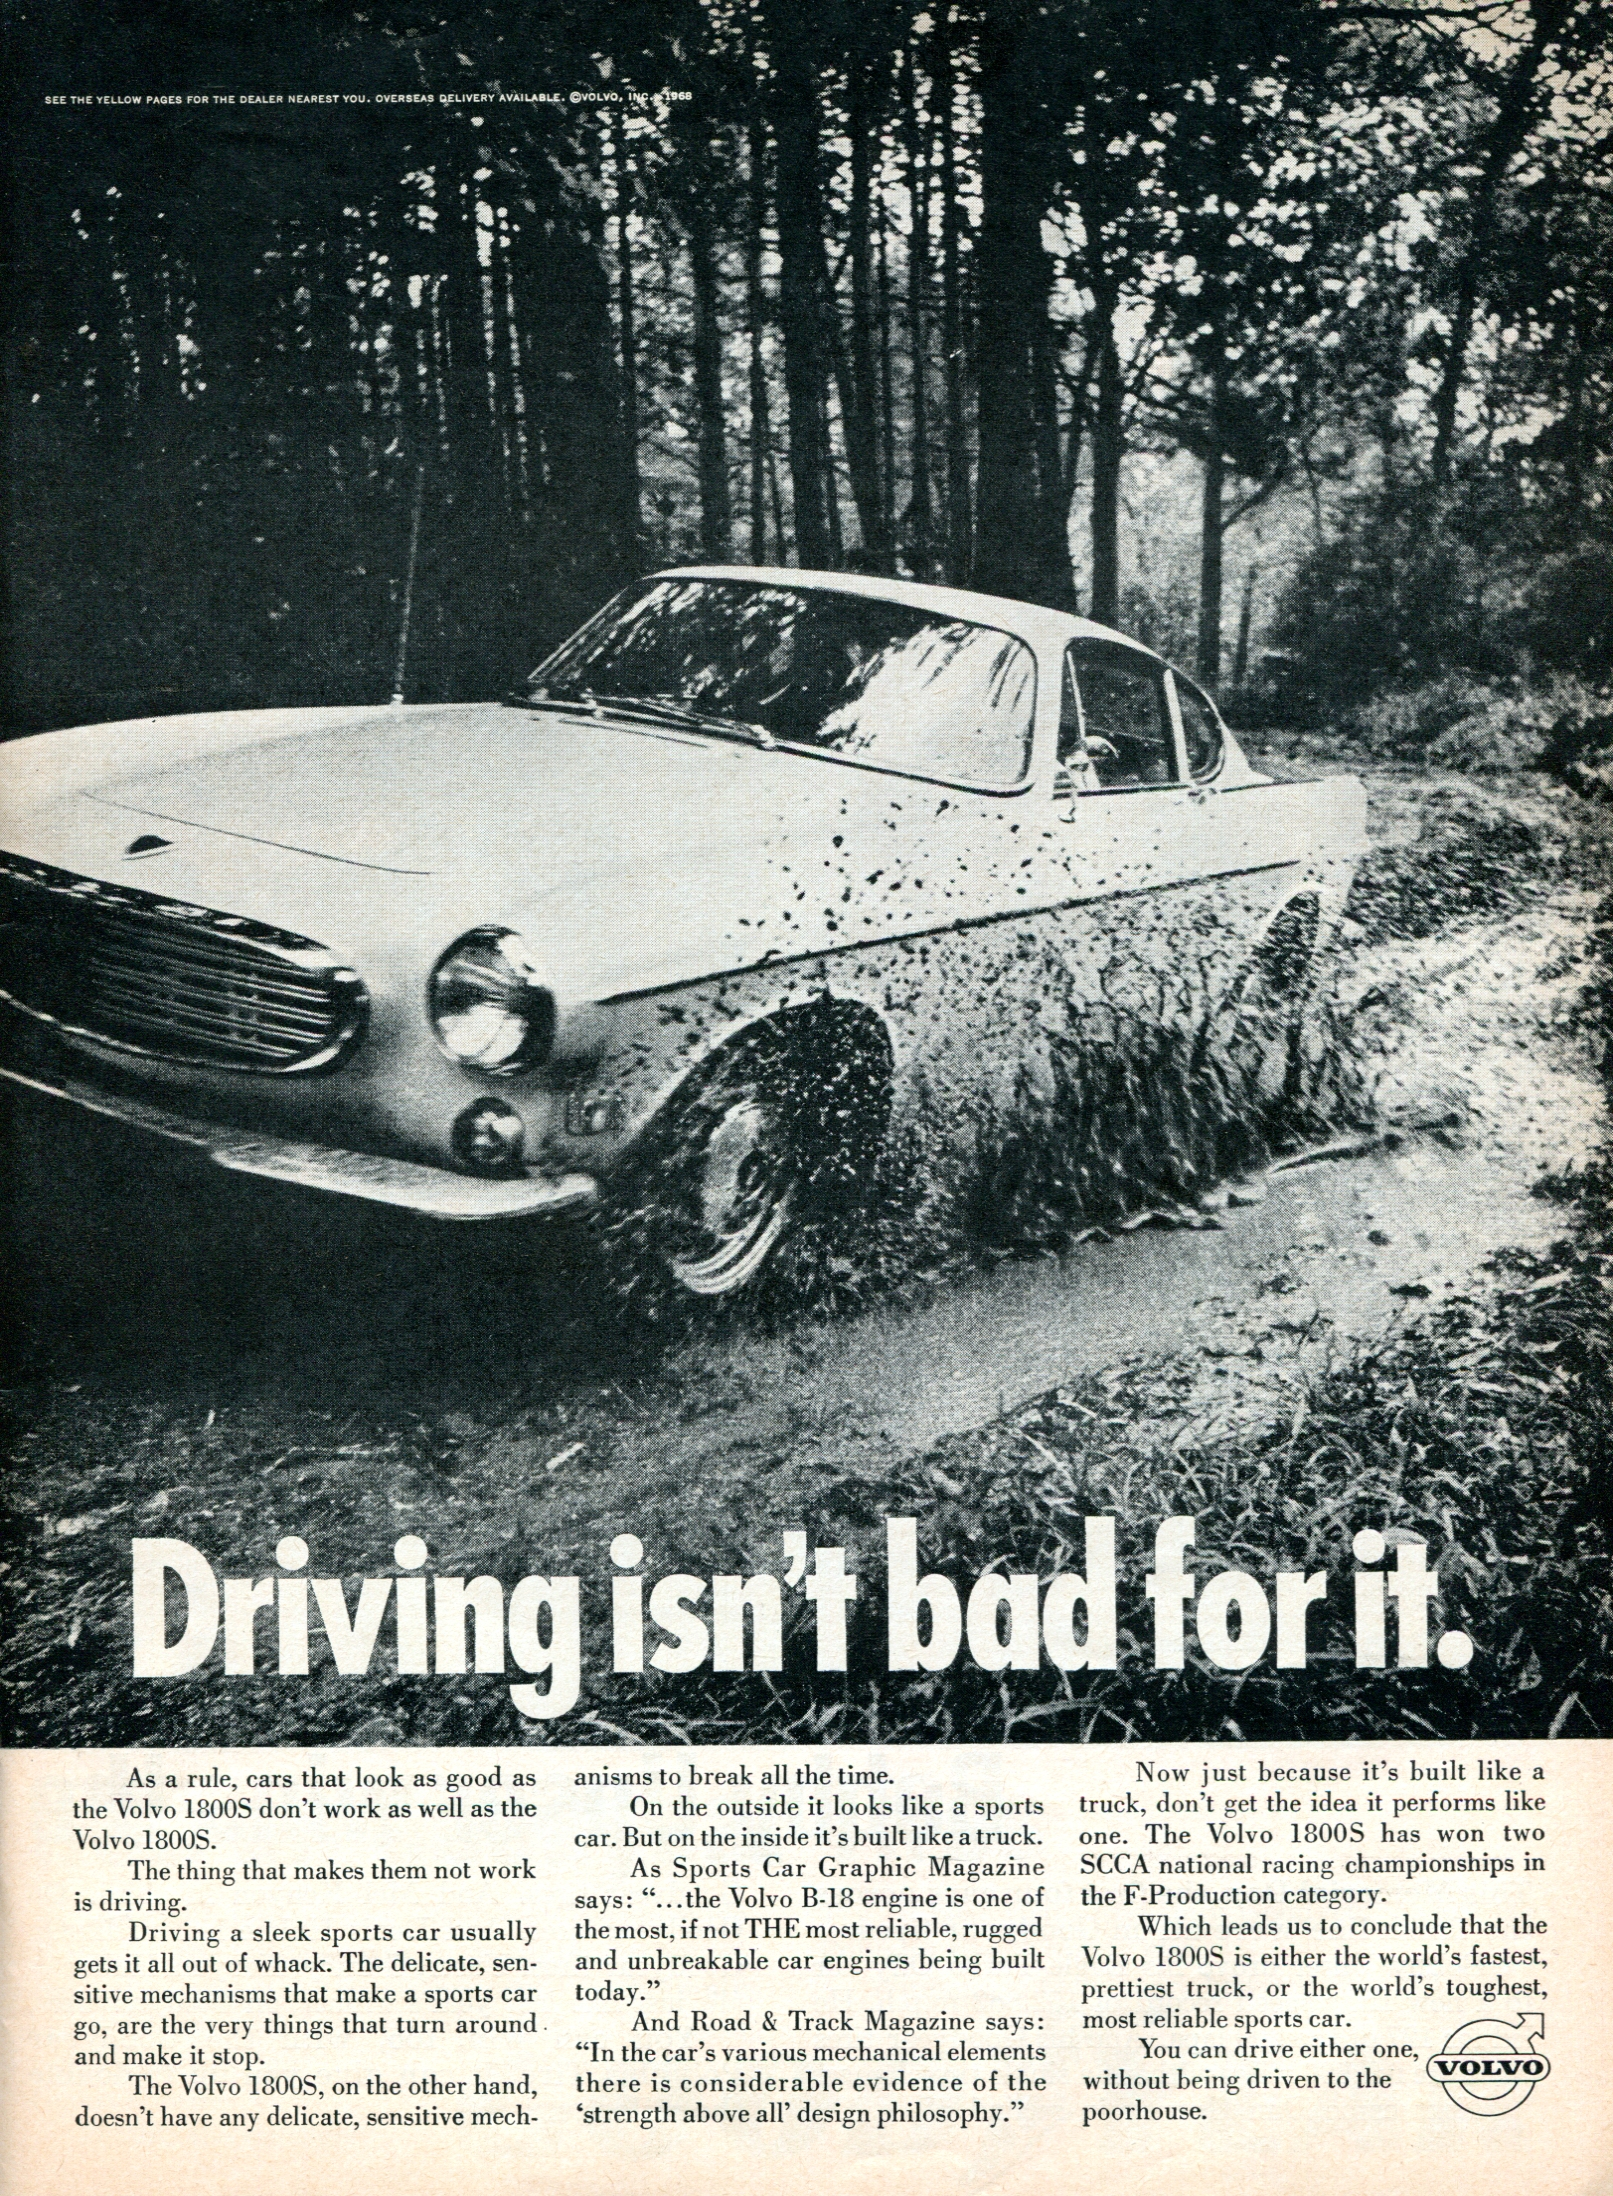 1968 volvo ad 1800S